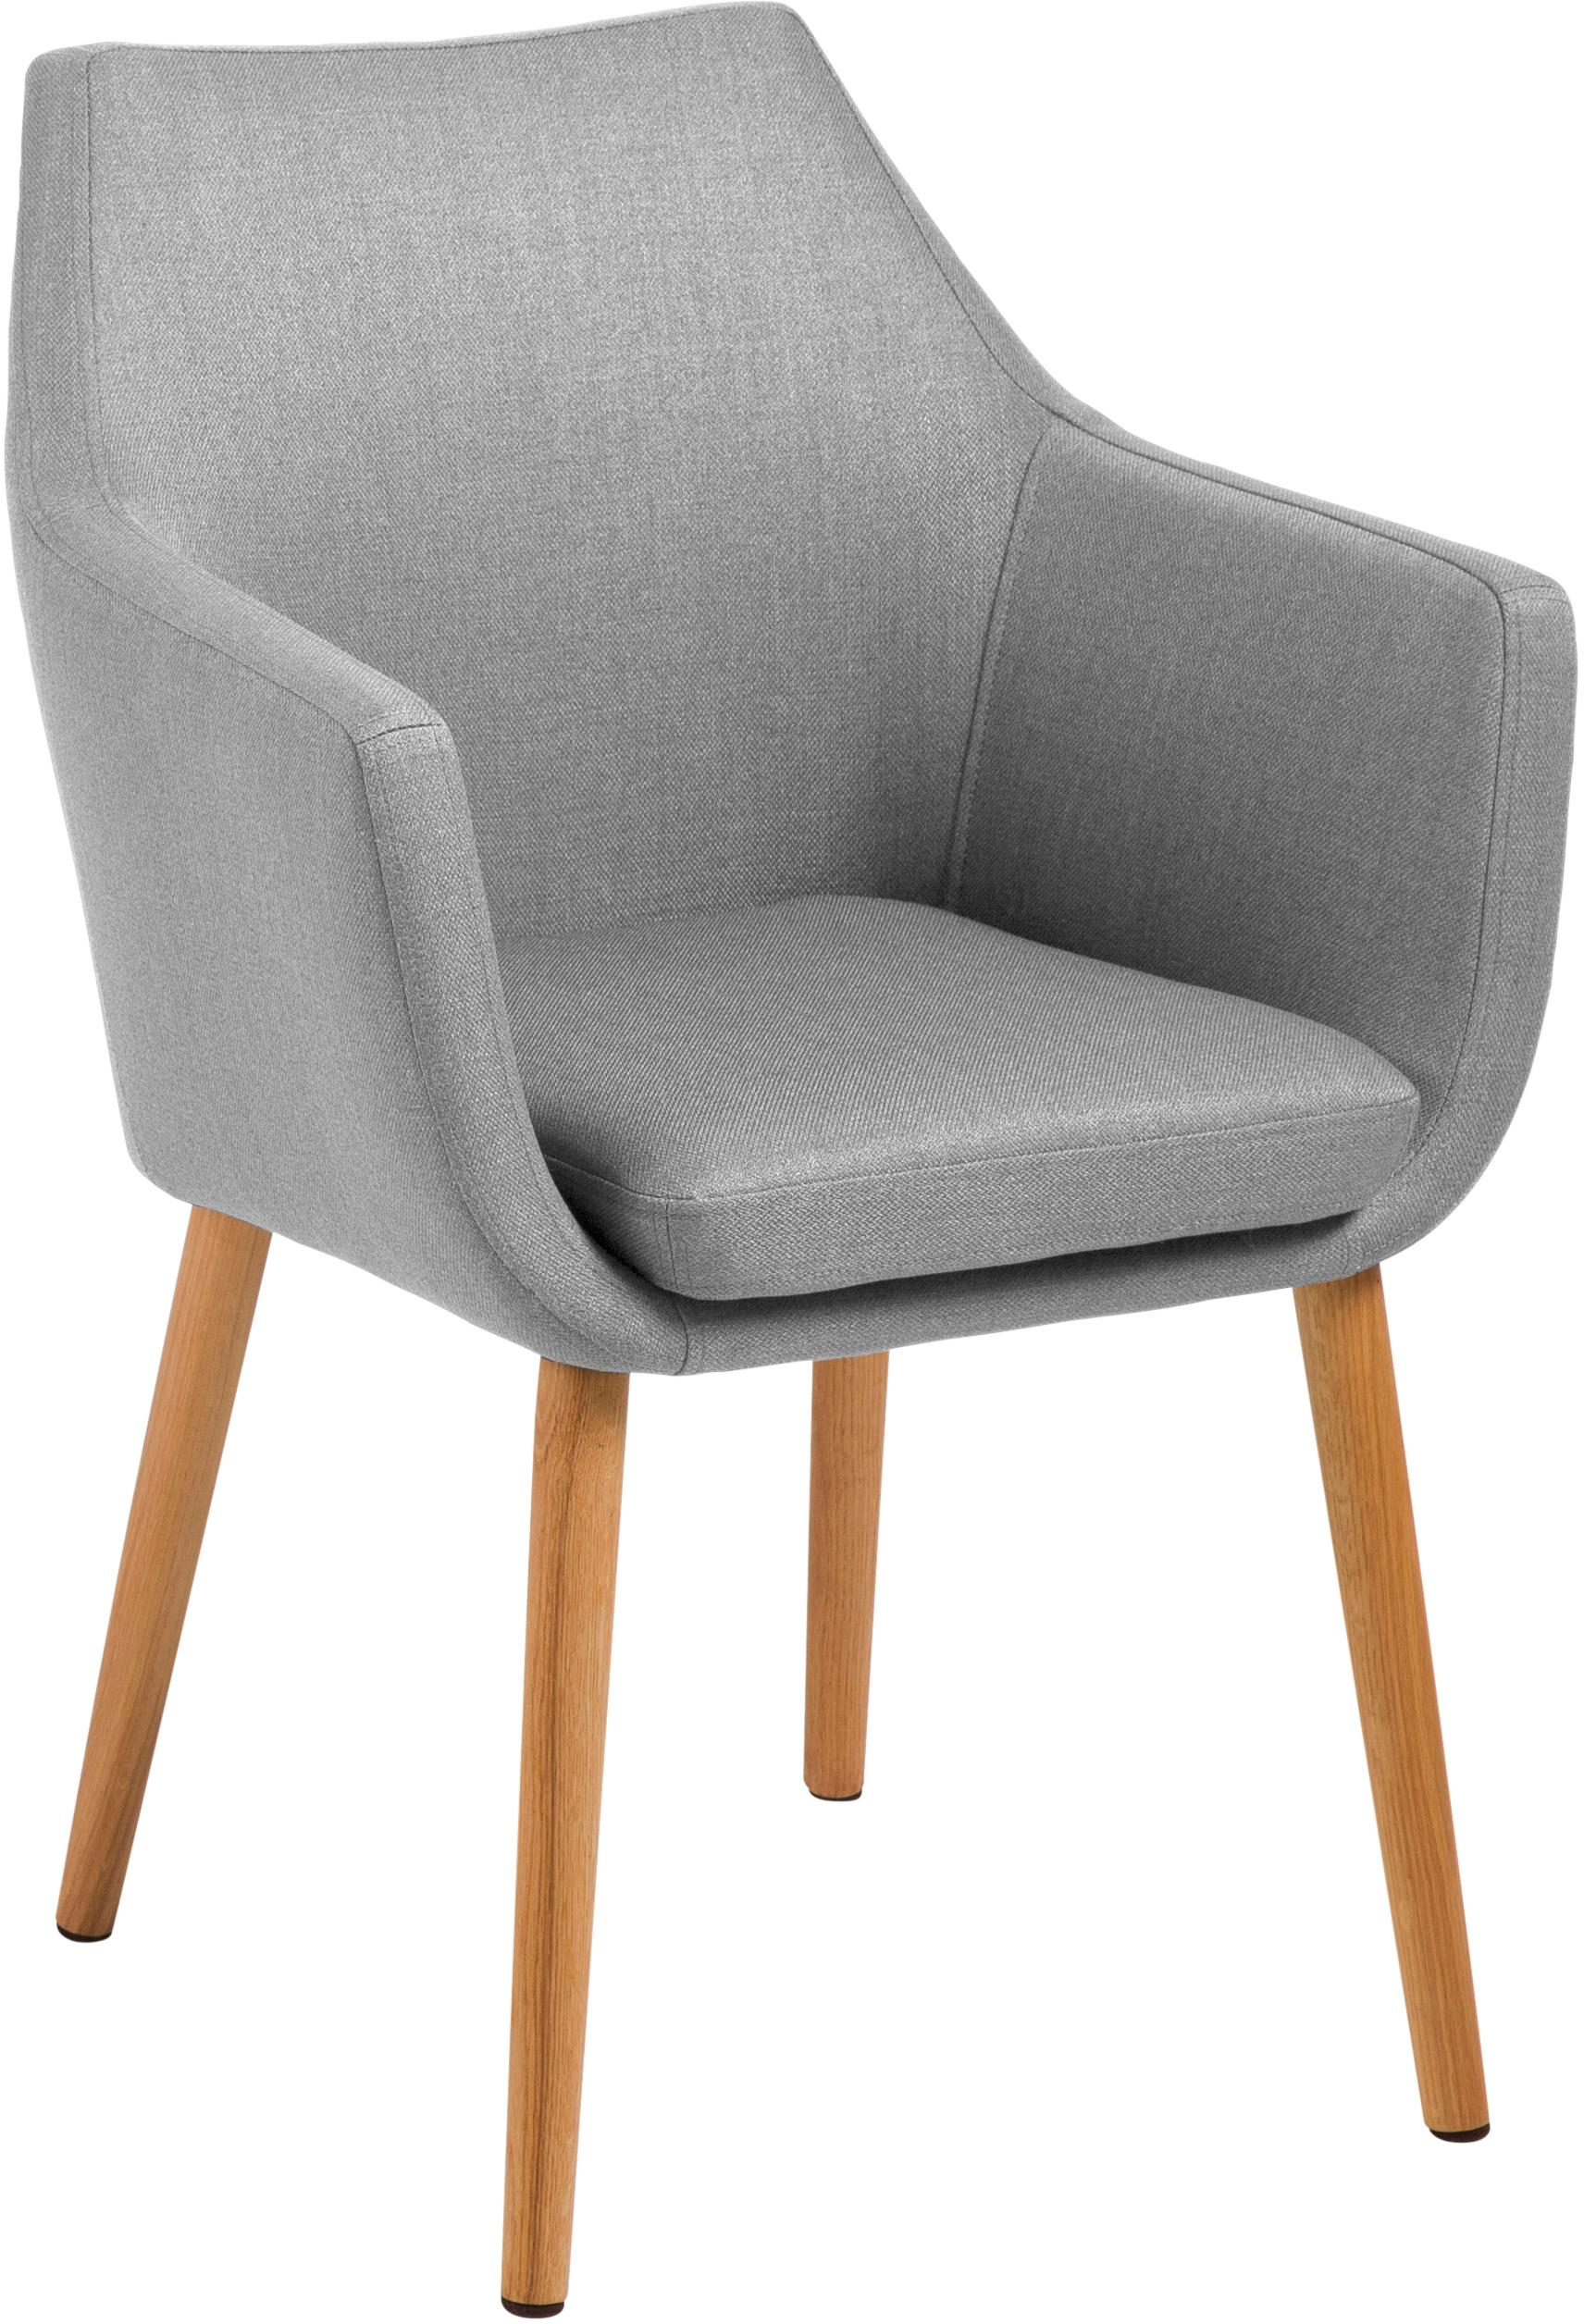 Armstoel Nora in Scandi design, Bekleding: 100% polyester, Poten: eikenhout, Bekleding: lichtgrijs. Frame: eikenhoutkleurig, 58 x 84 cm